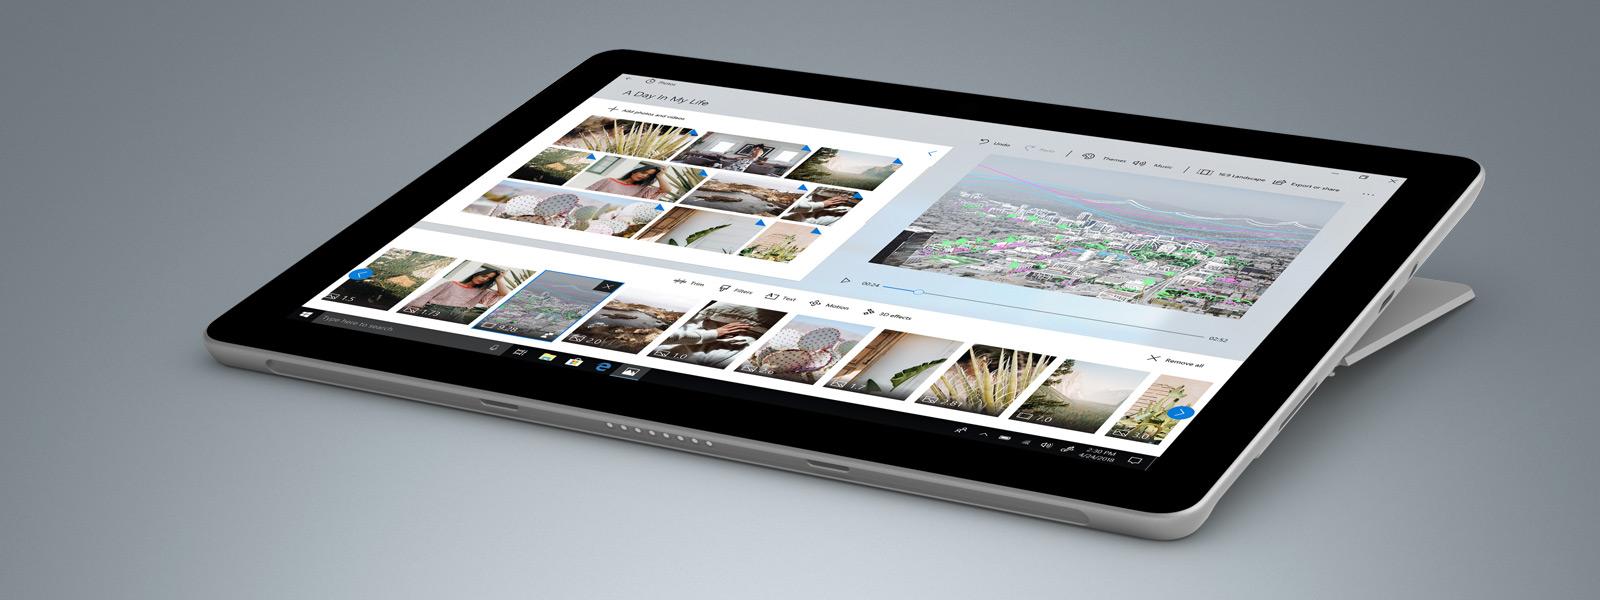 Surface Go พร้อมแอปรูปถ่าย